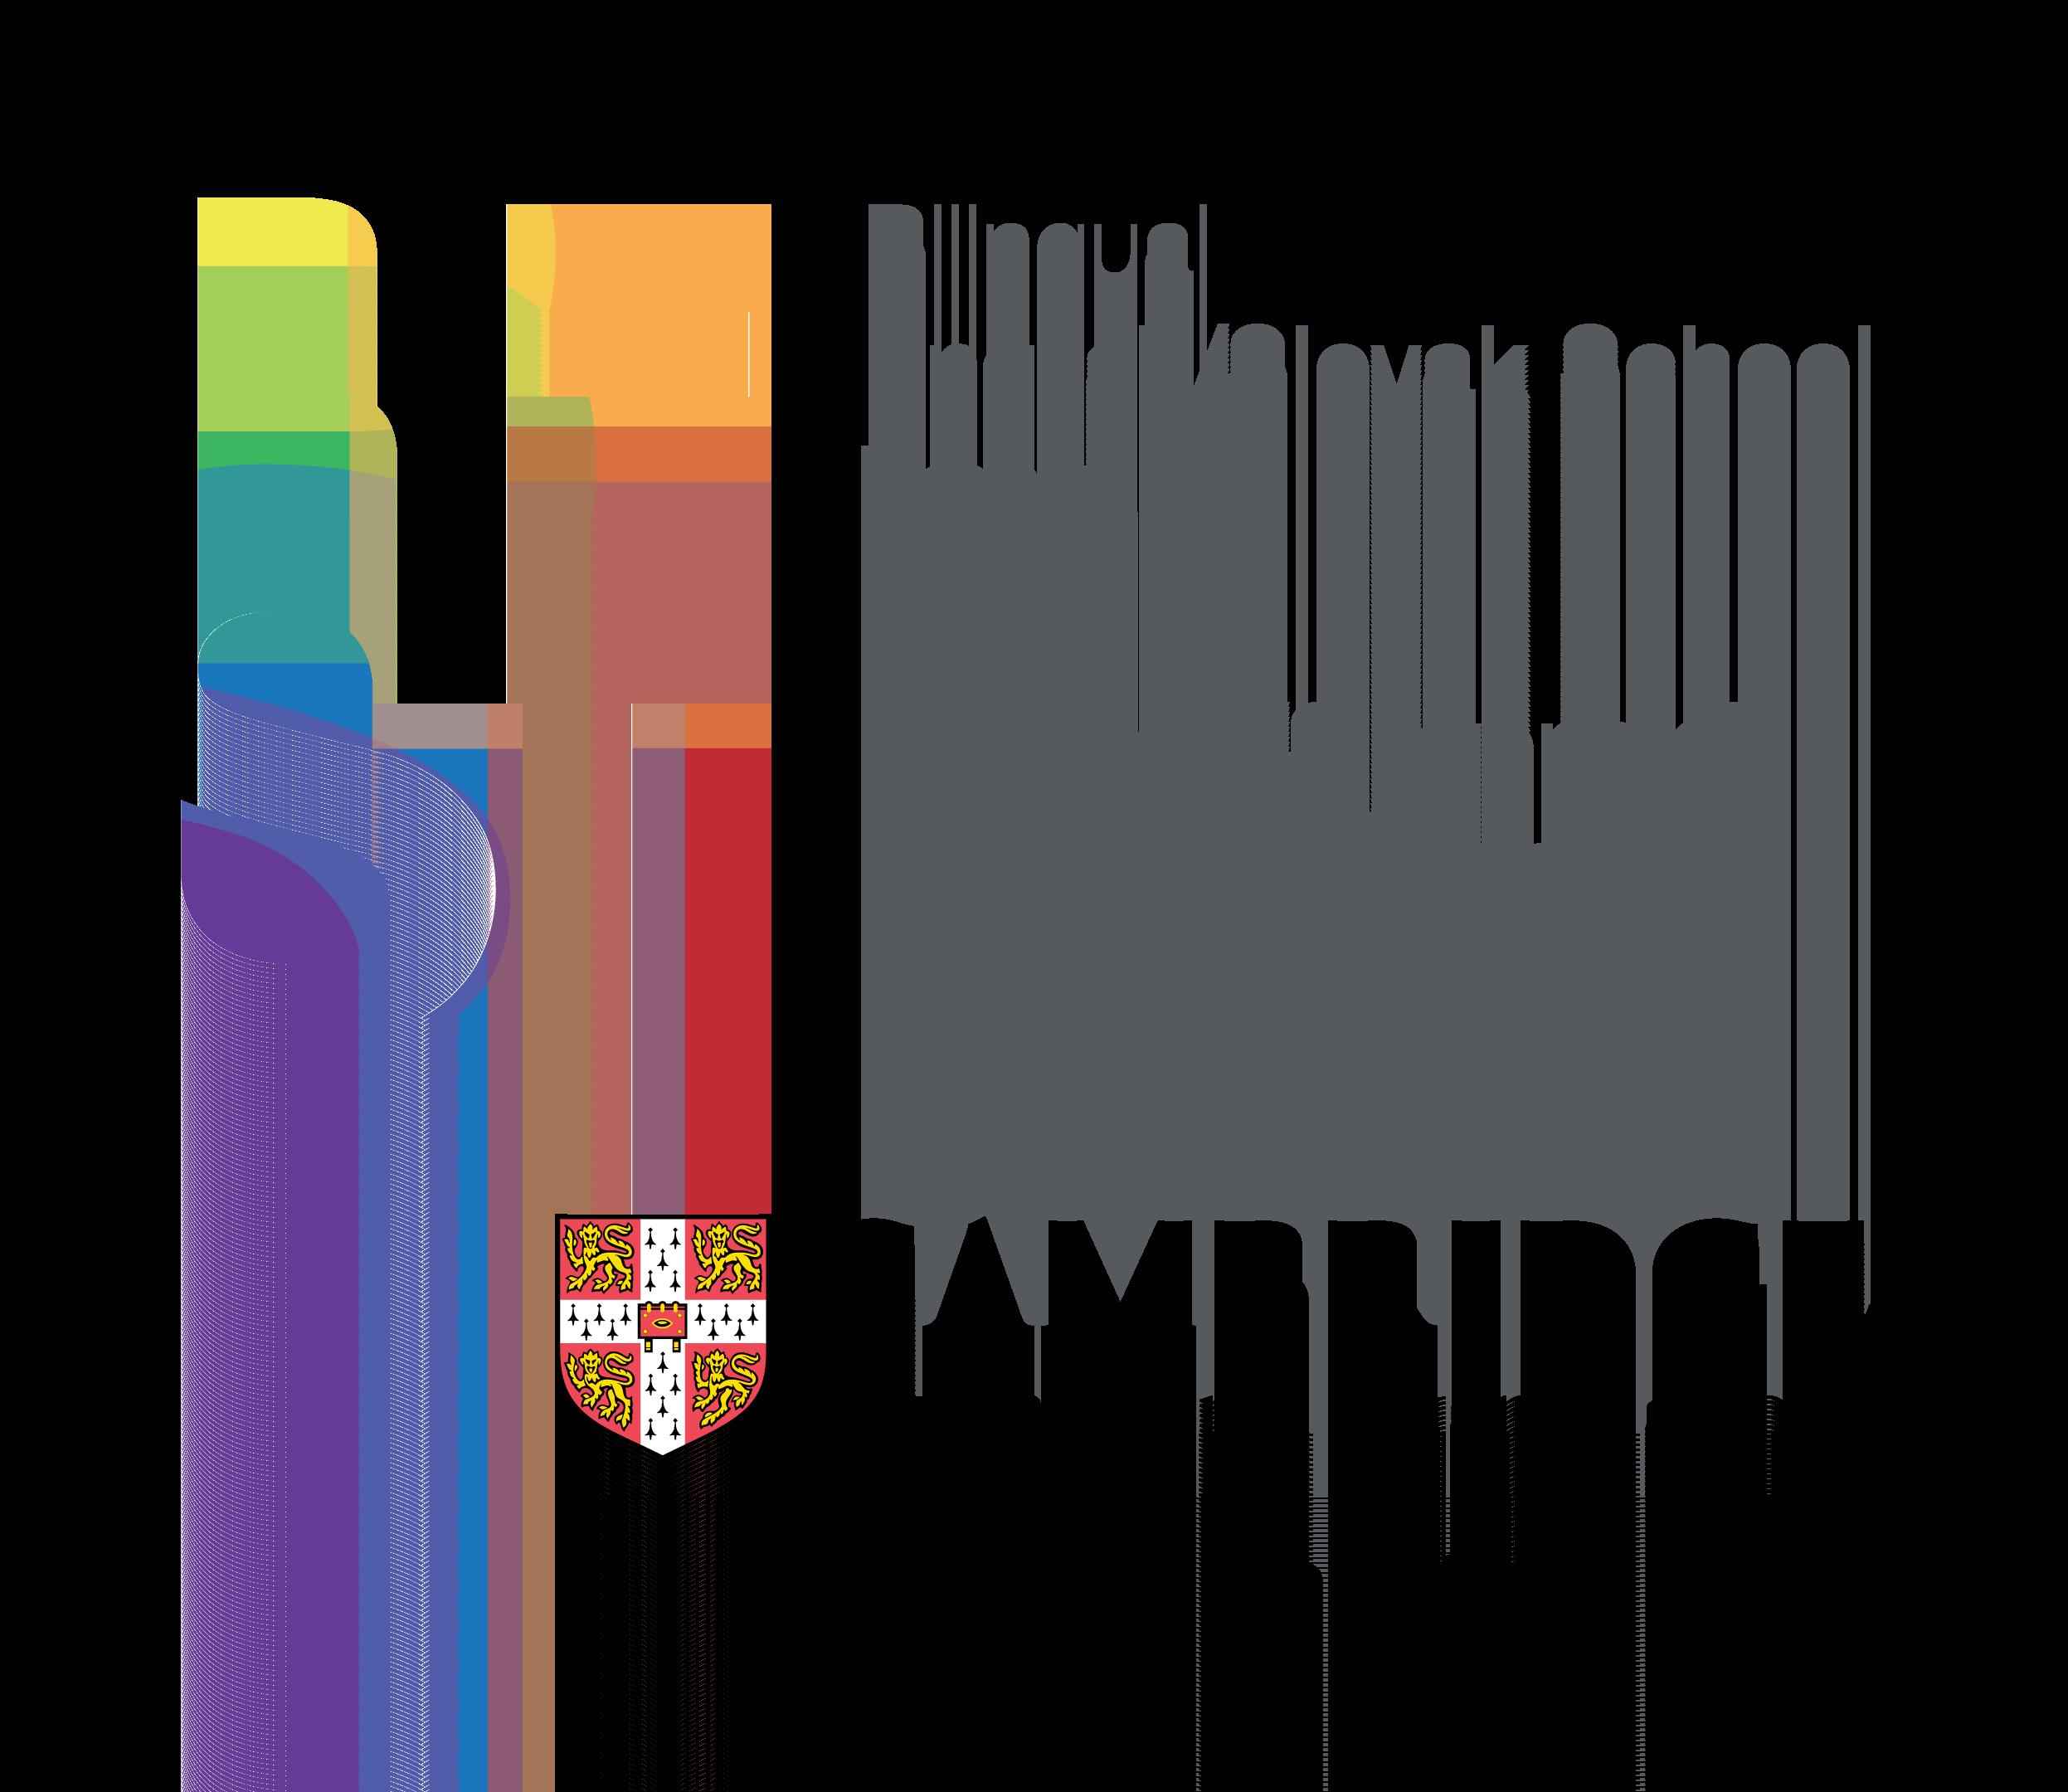 BESST-CIC-logo-1to1-fullcolour-CMYK-AI3-New-Cambridge.png